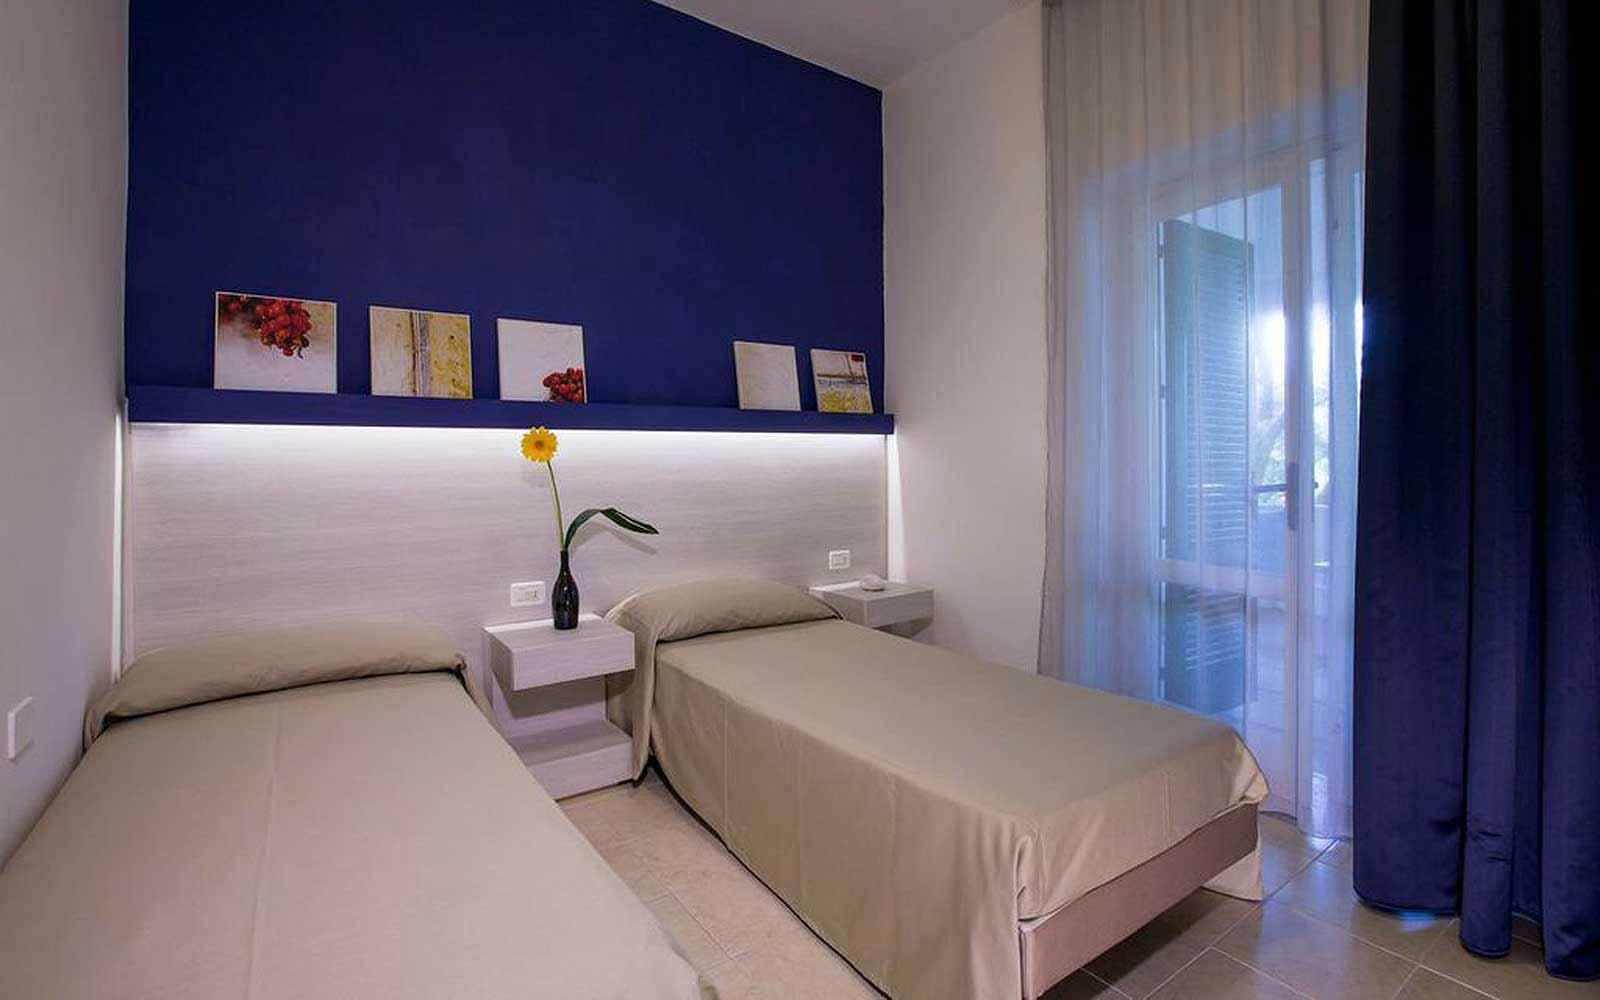 Family Comfort room at the Gattarella Resort